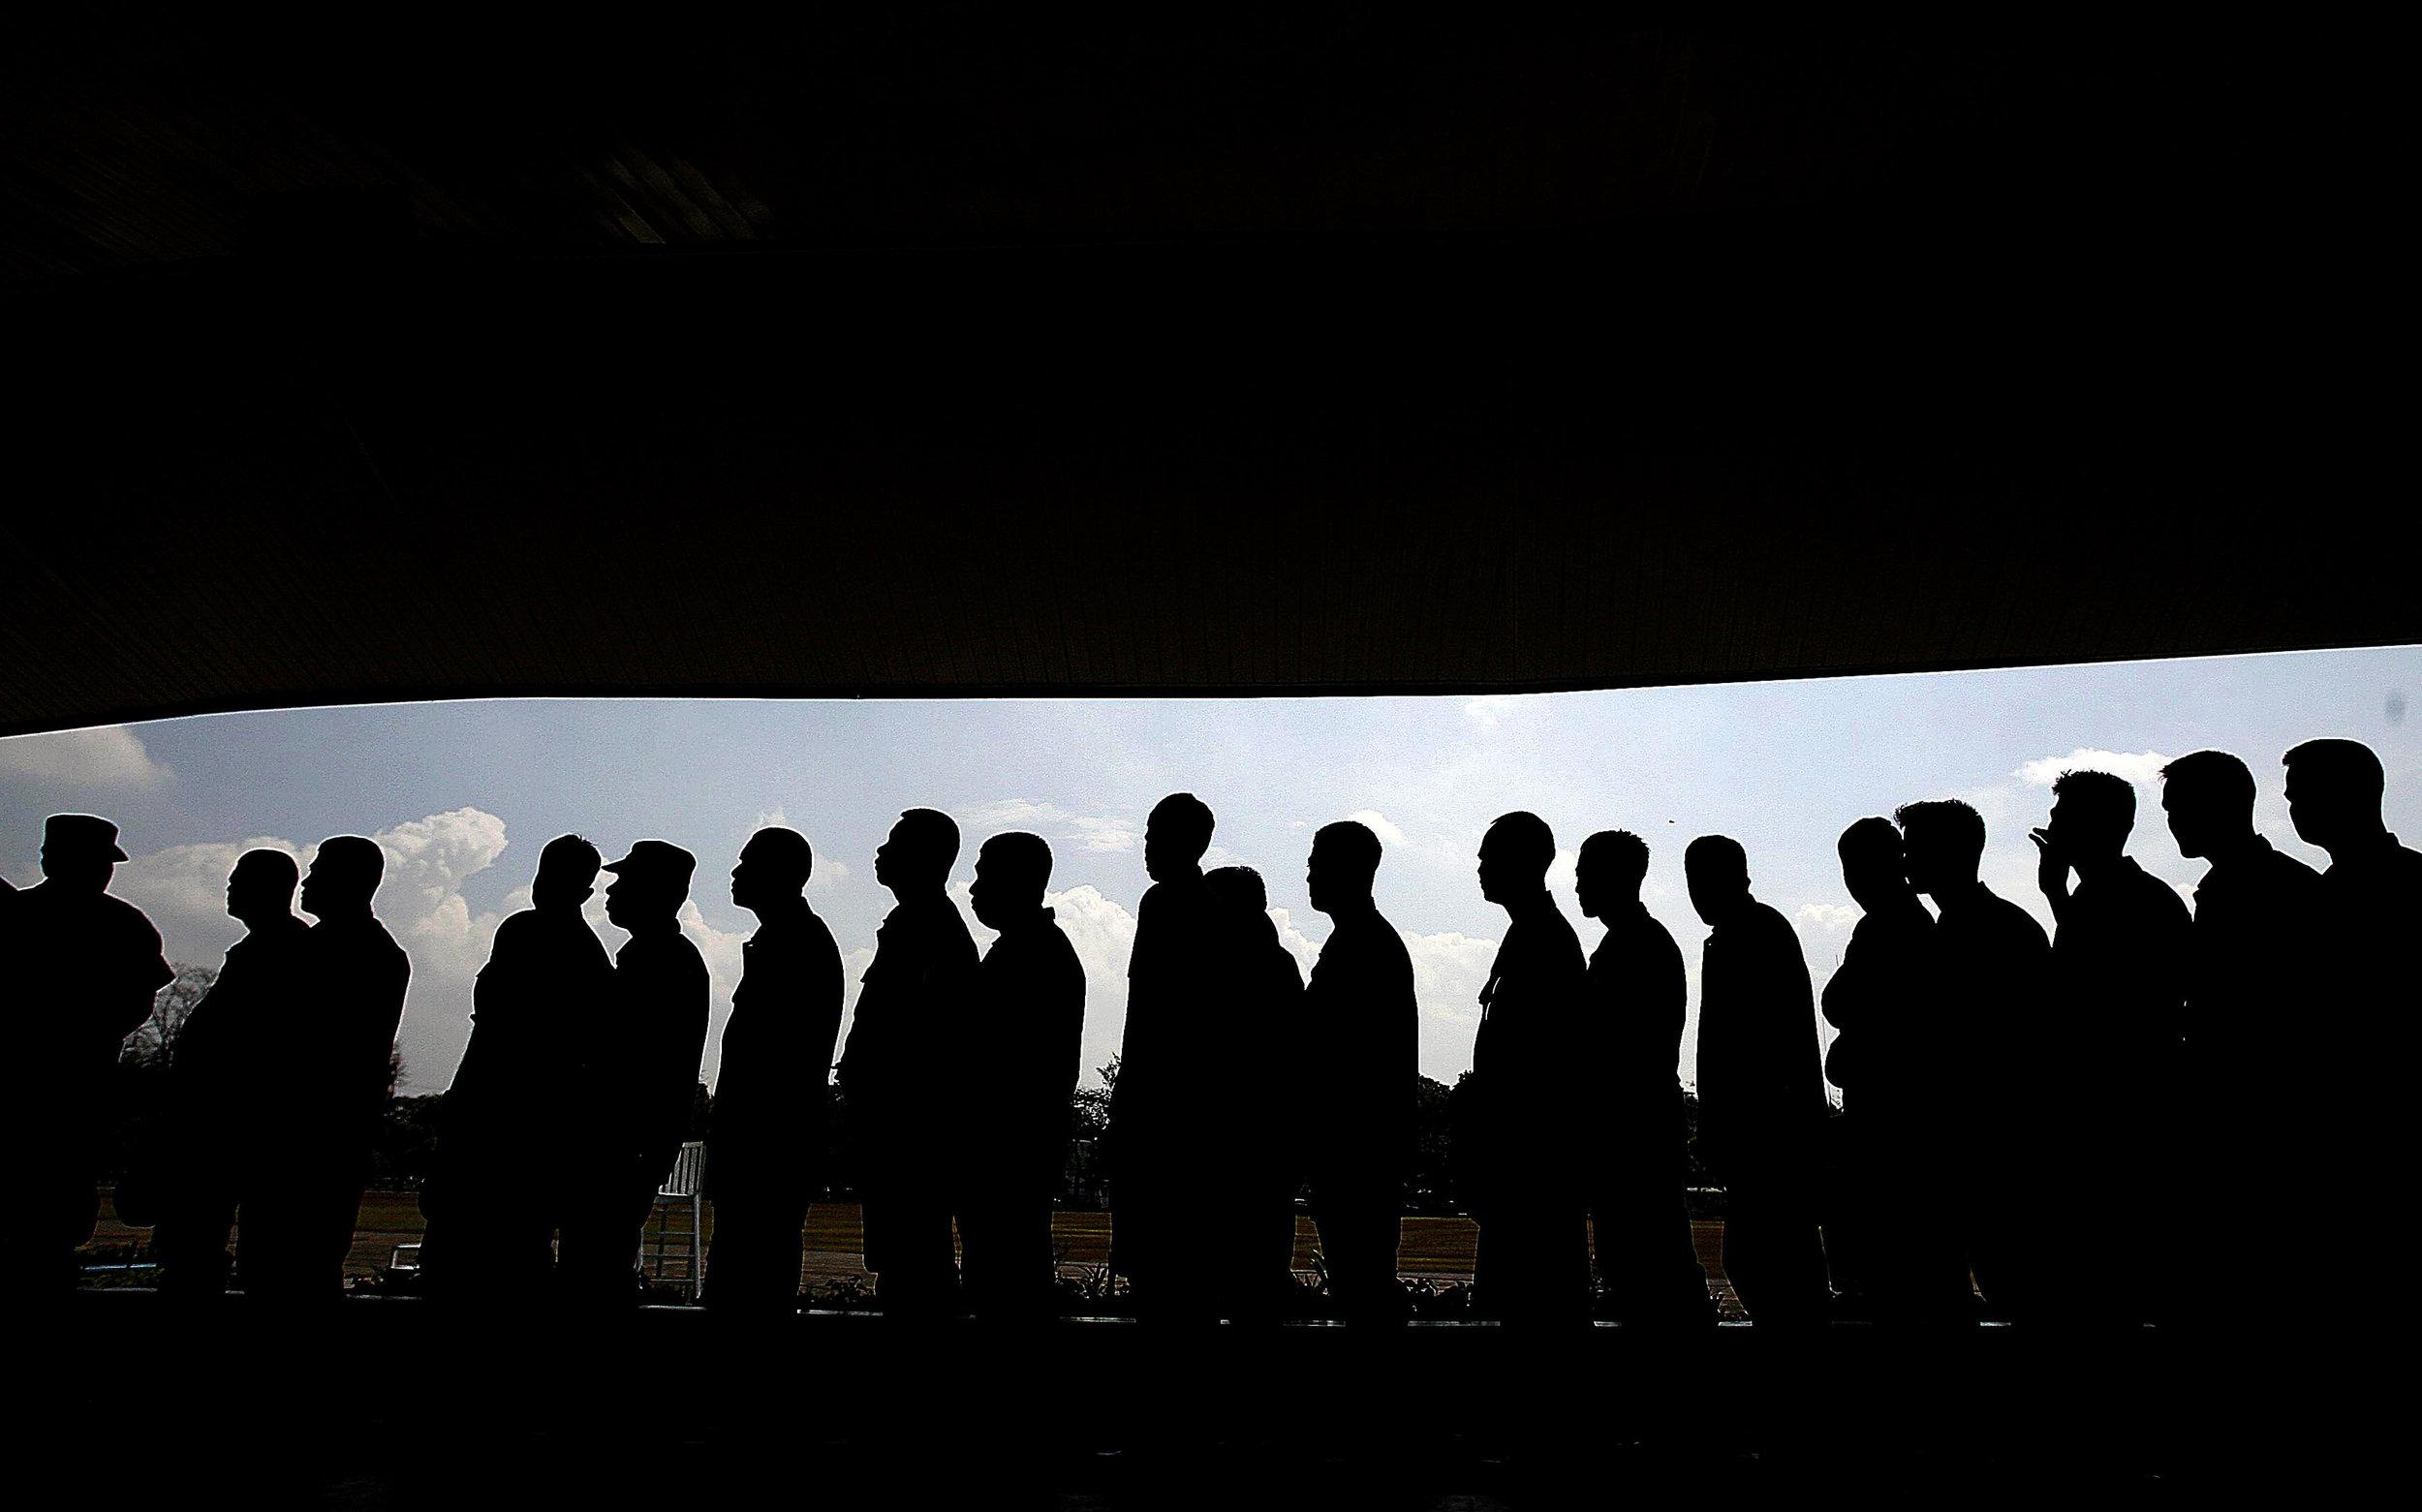 Human trafficking arrests in LA